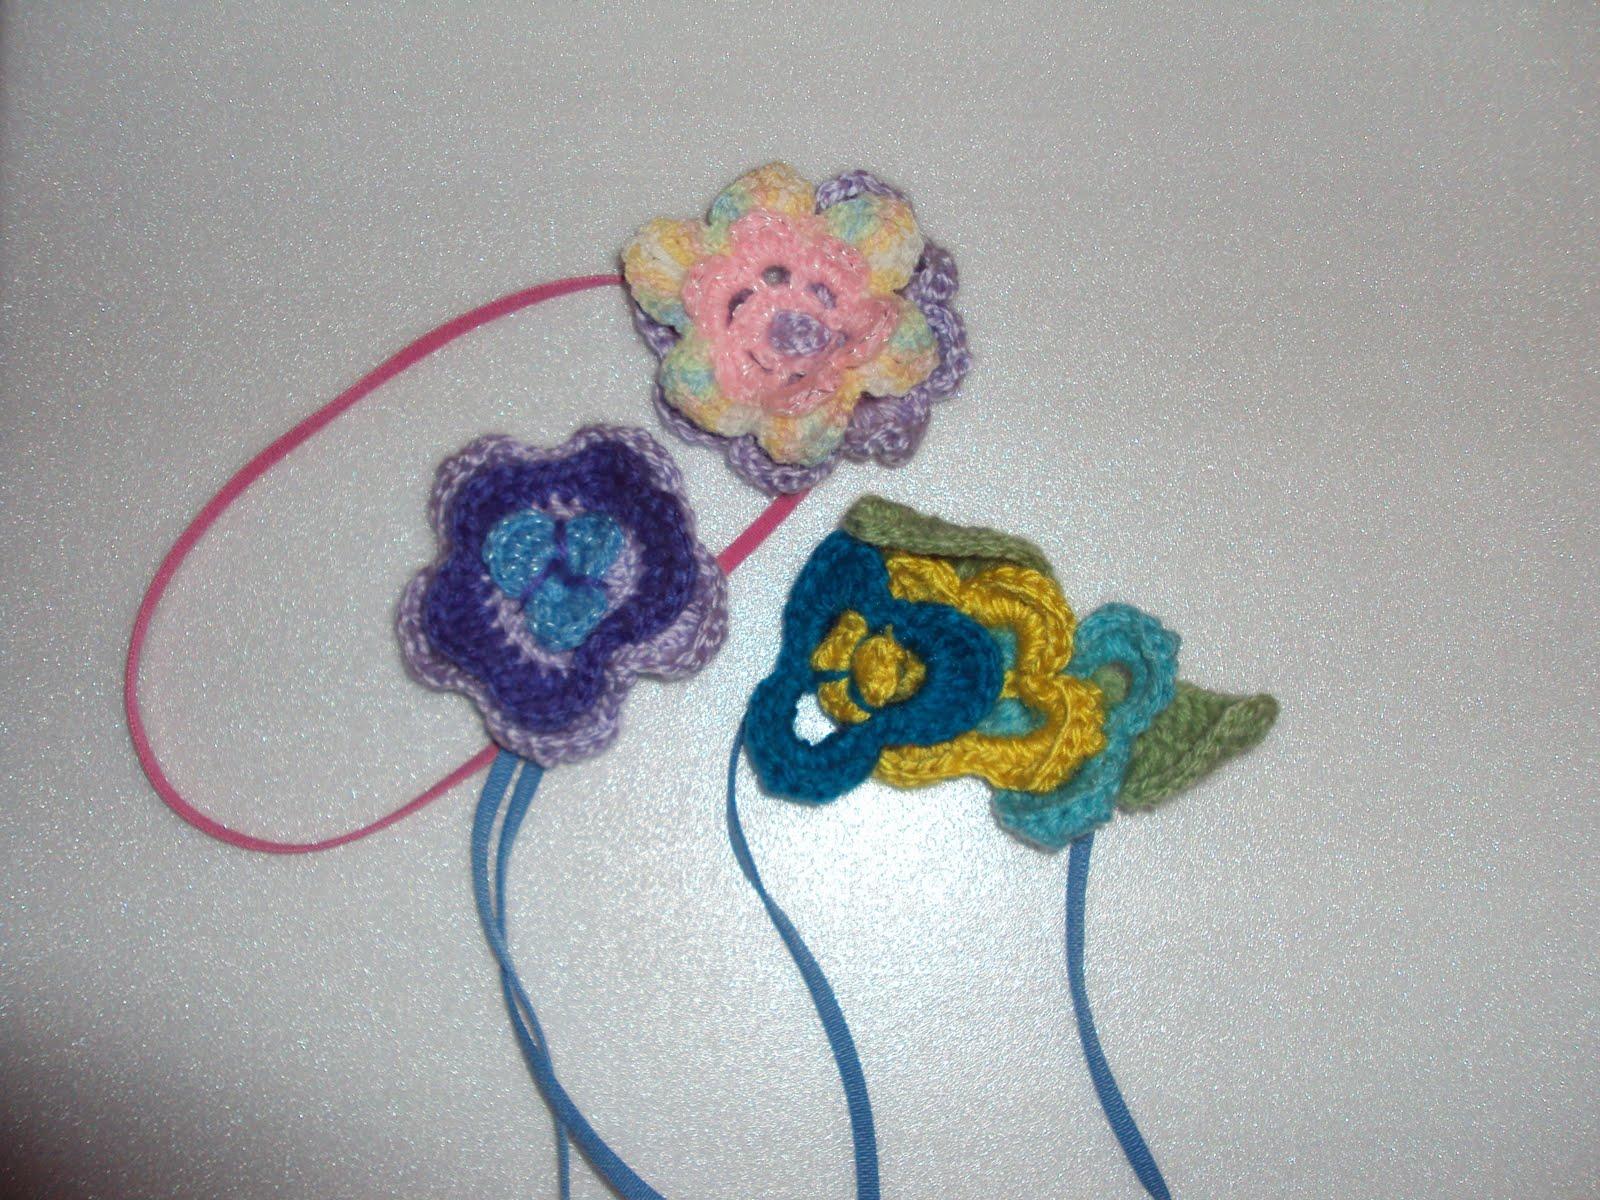 Son todos Cintillos en Tejidos Crochet para niñas o adultos, muy ...